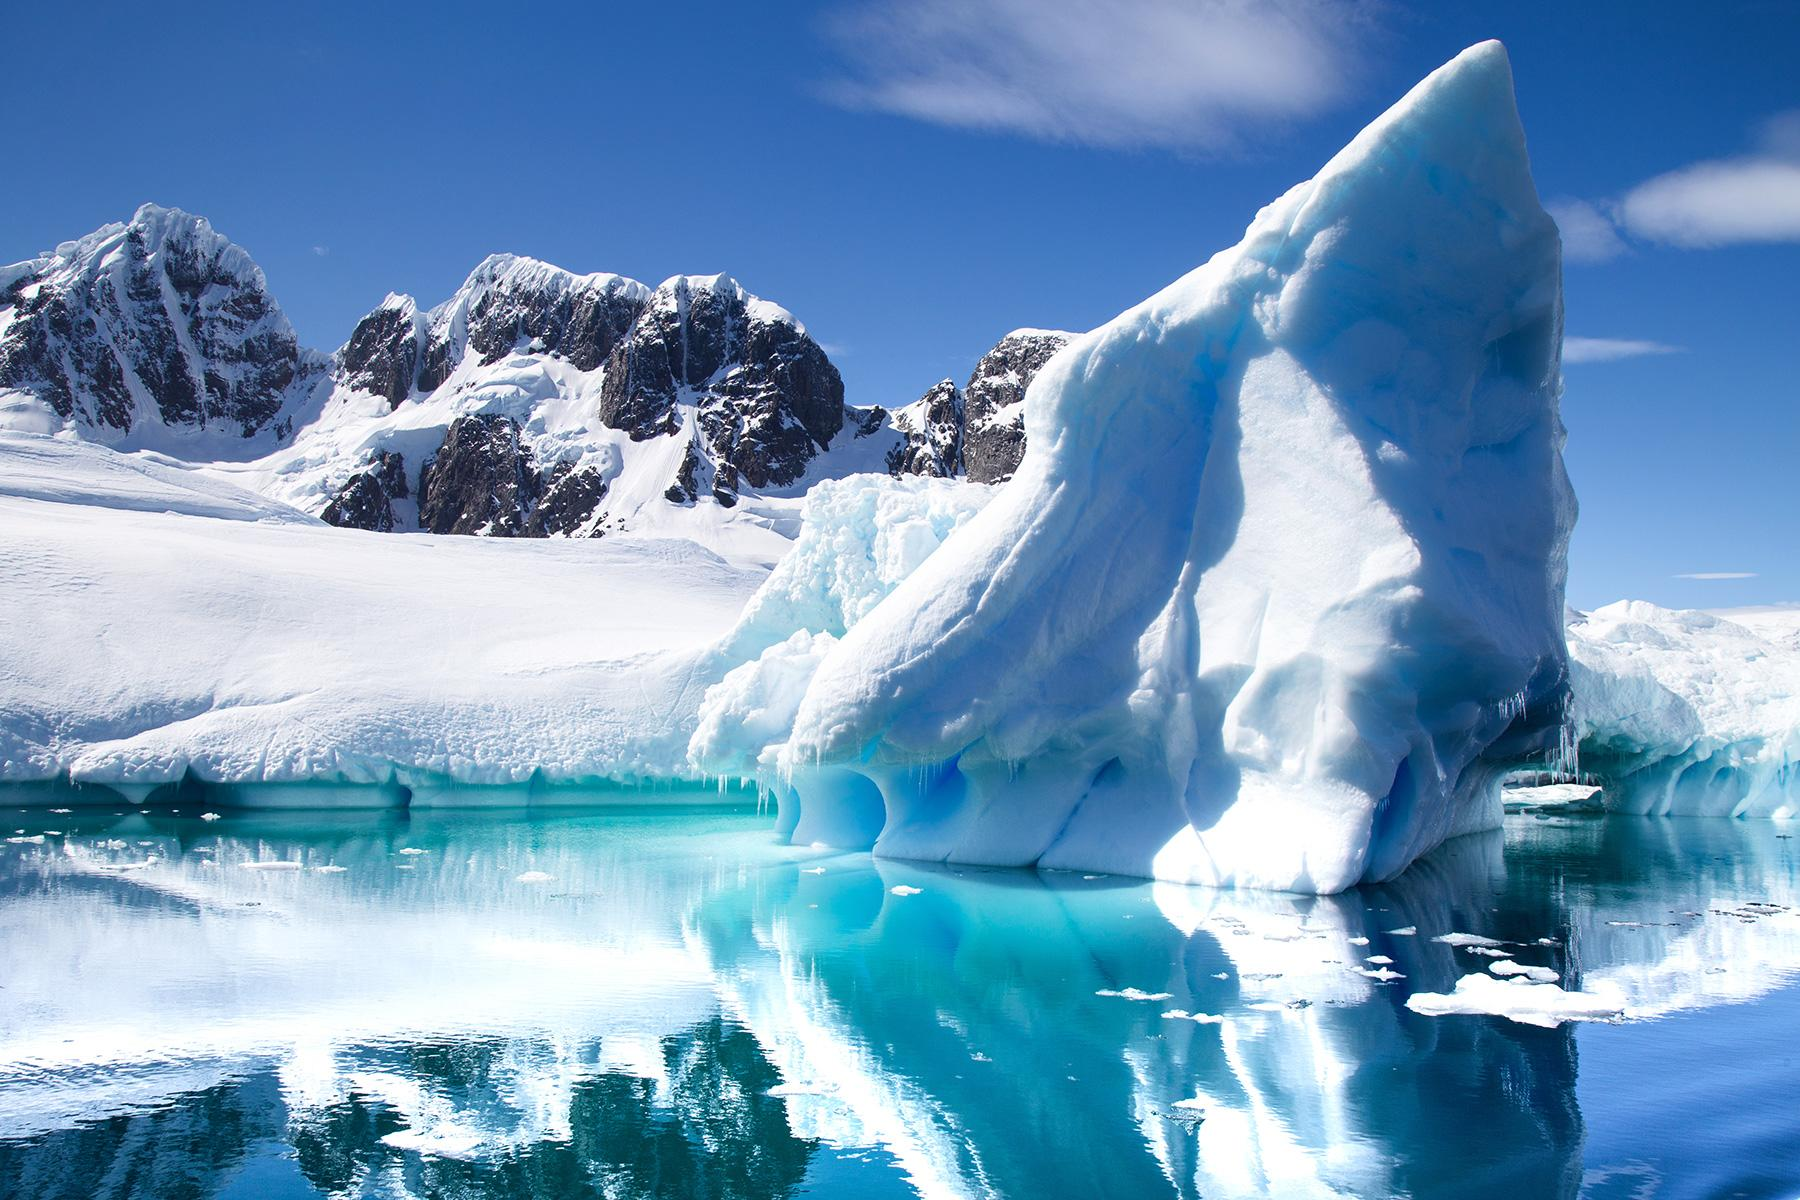 7_Antartica101_WontComeBackSame_shutterstock_793276882_1